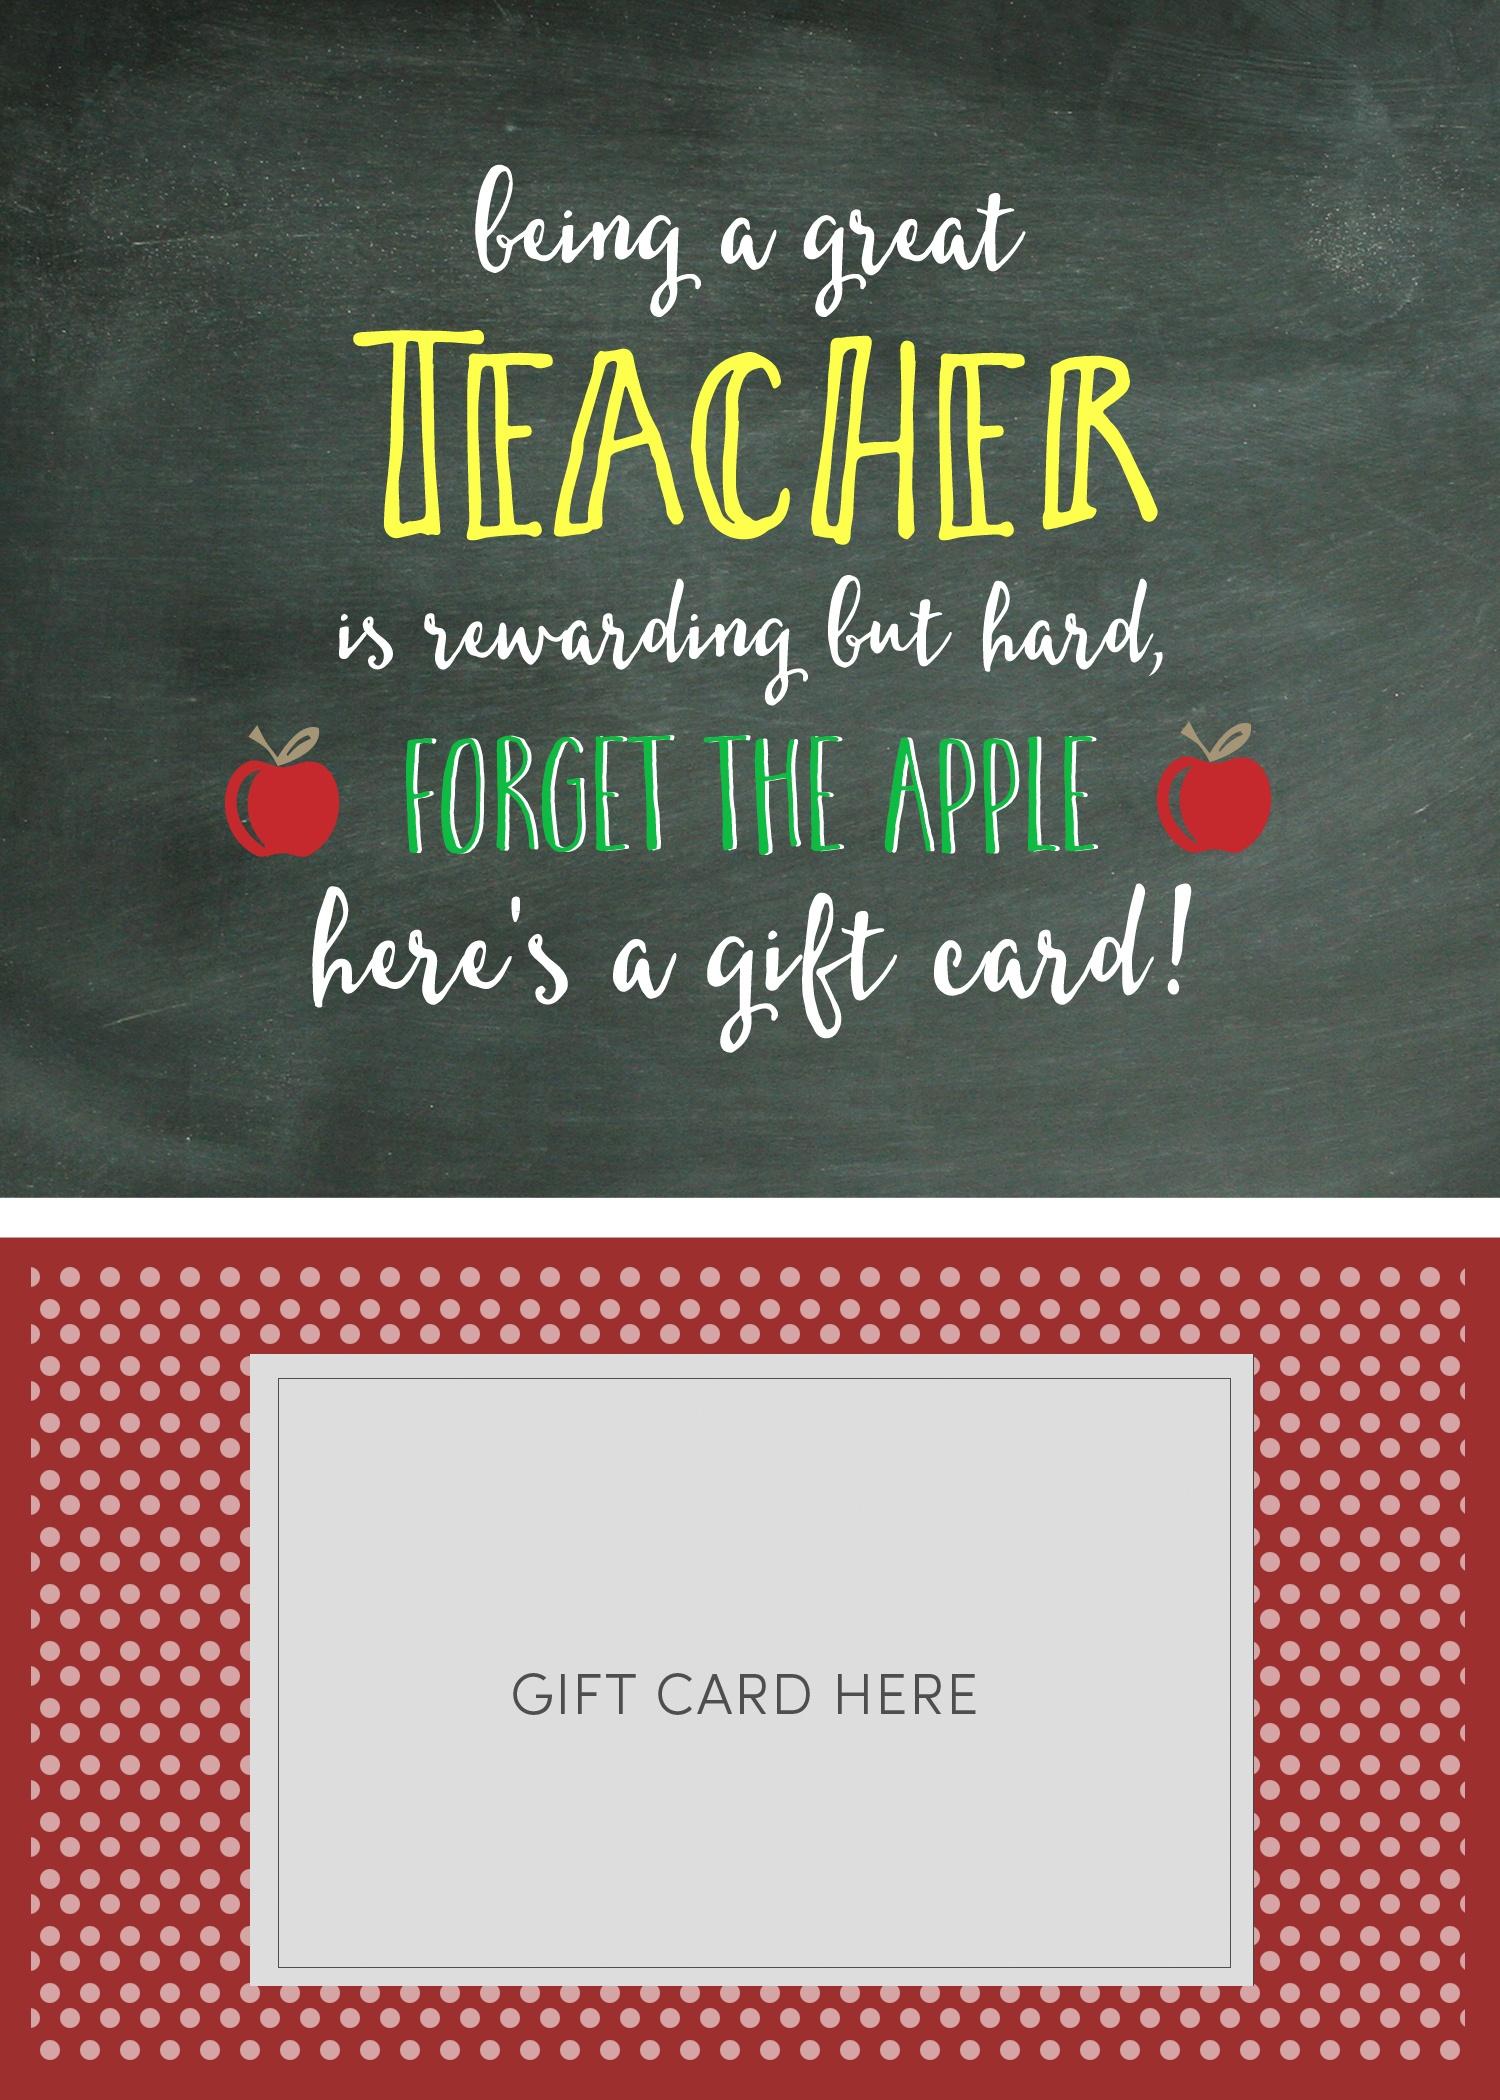 Teacher Appreciation Gift Card Holder - Lil' Luna - Free Printable Teacher Appreciation Greeting Cards